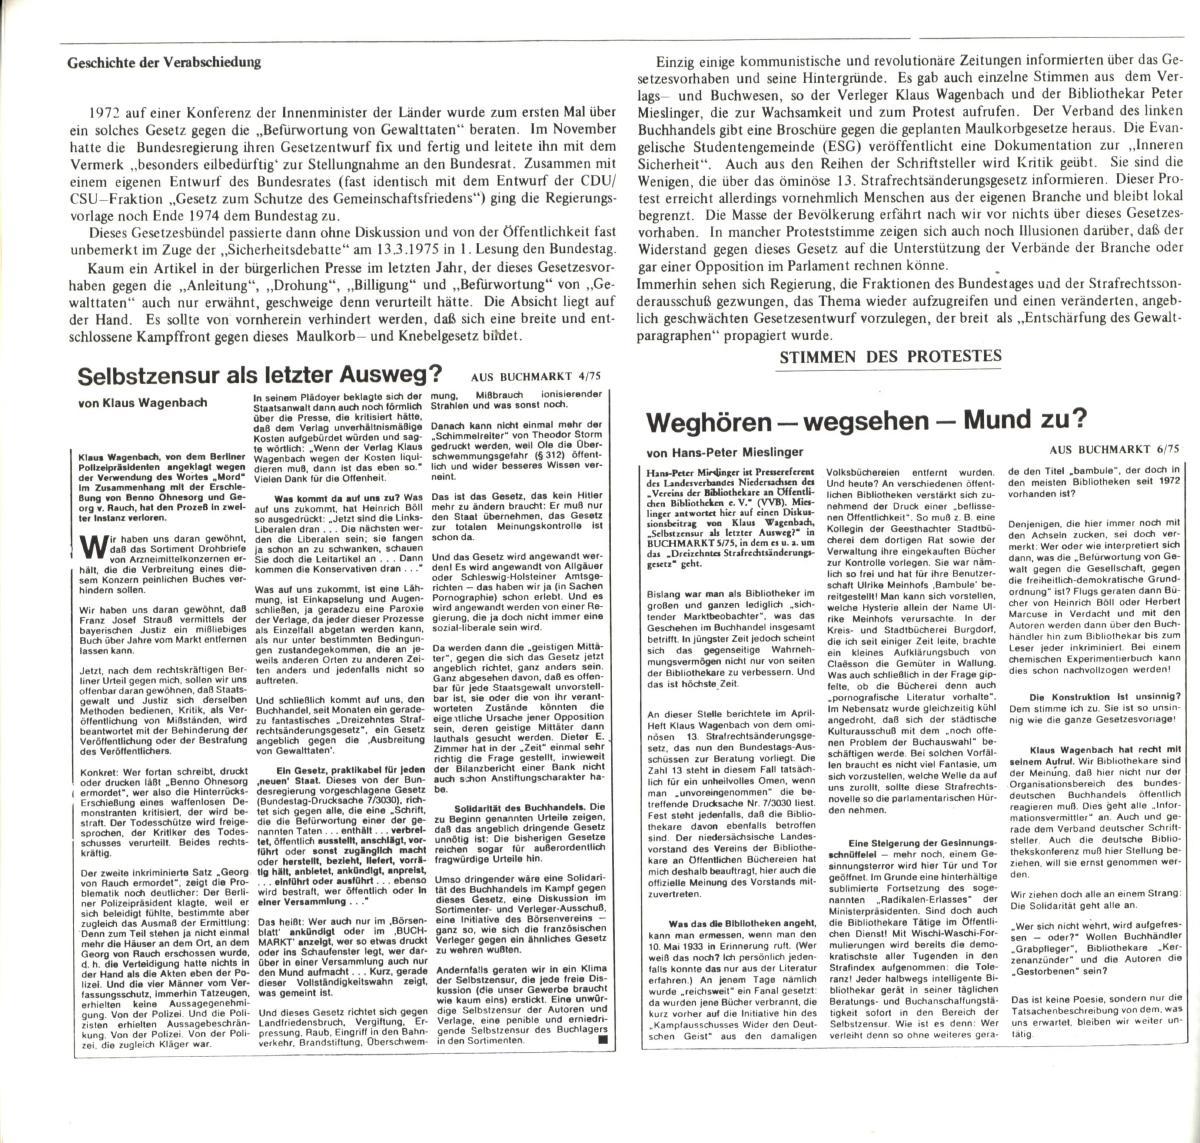 REP_VLB_1976_Die_Zensurgesetze_09